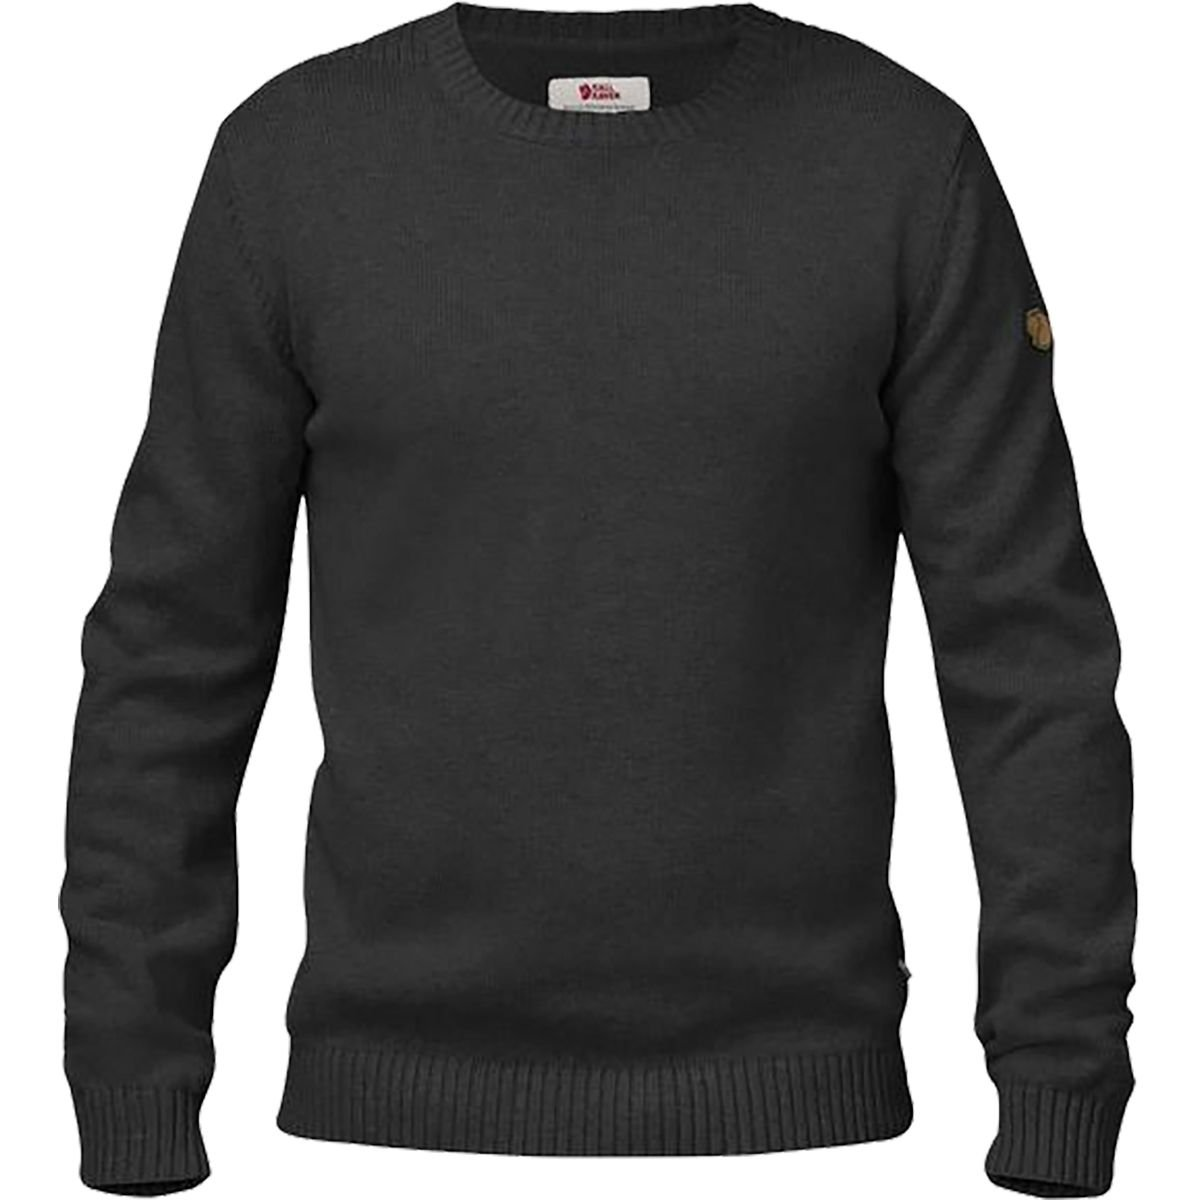 Fjallraven Men's Ovik Flat-Knitted Crew Neck Sweater - Medium - Dark Grey